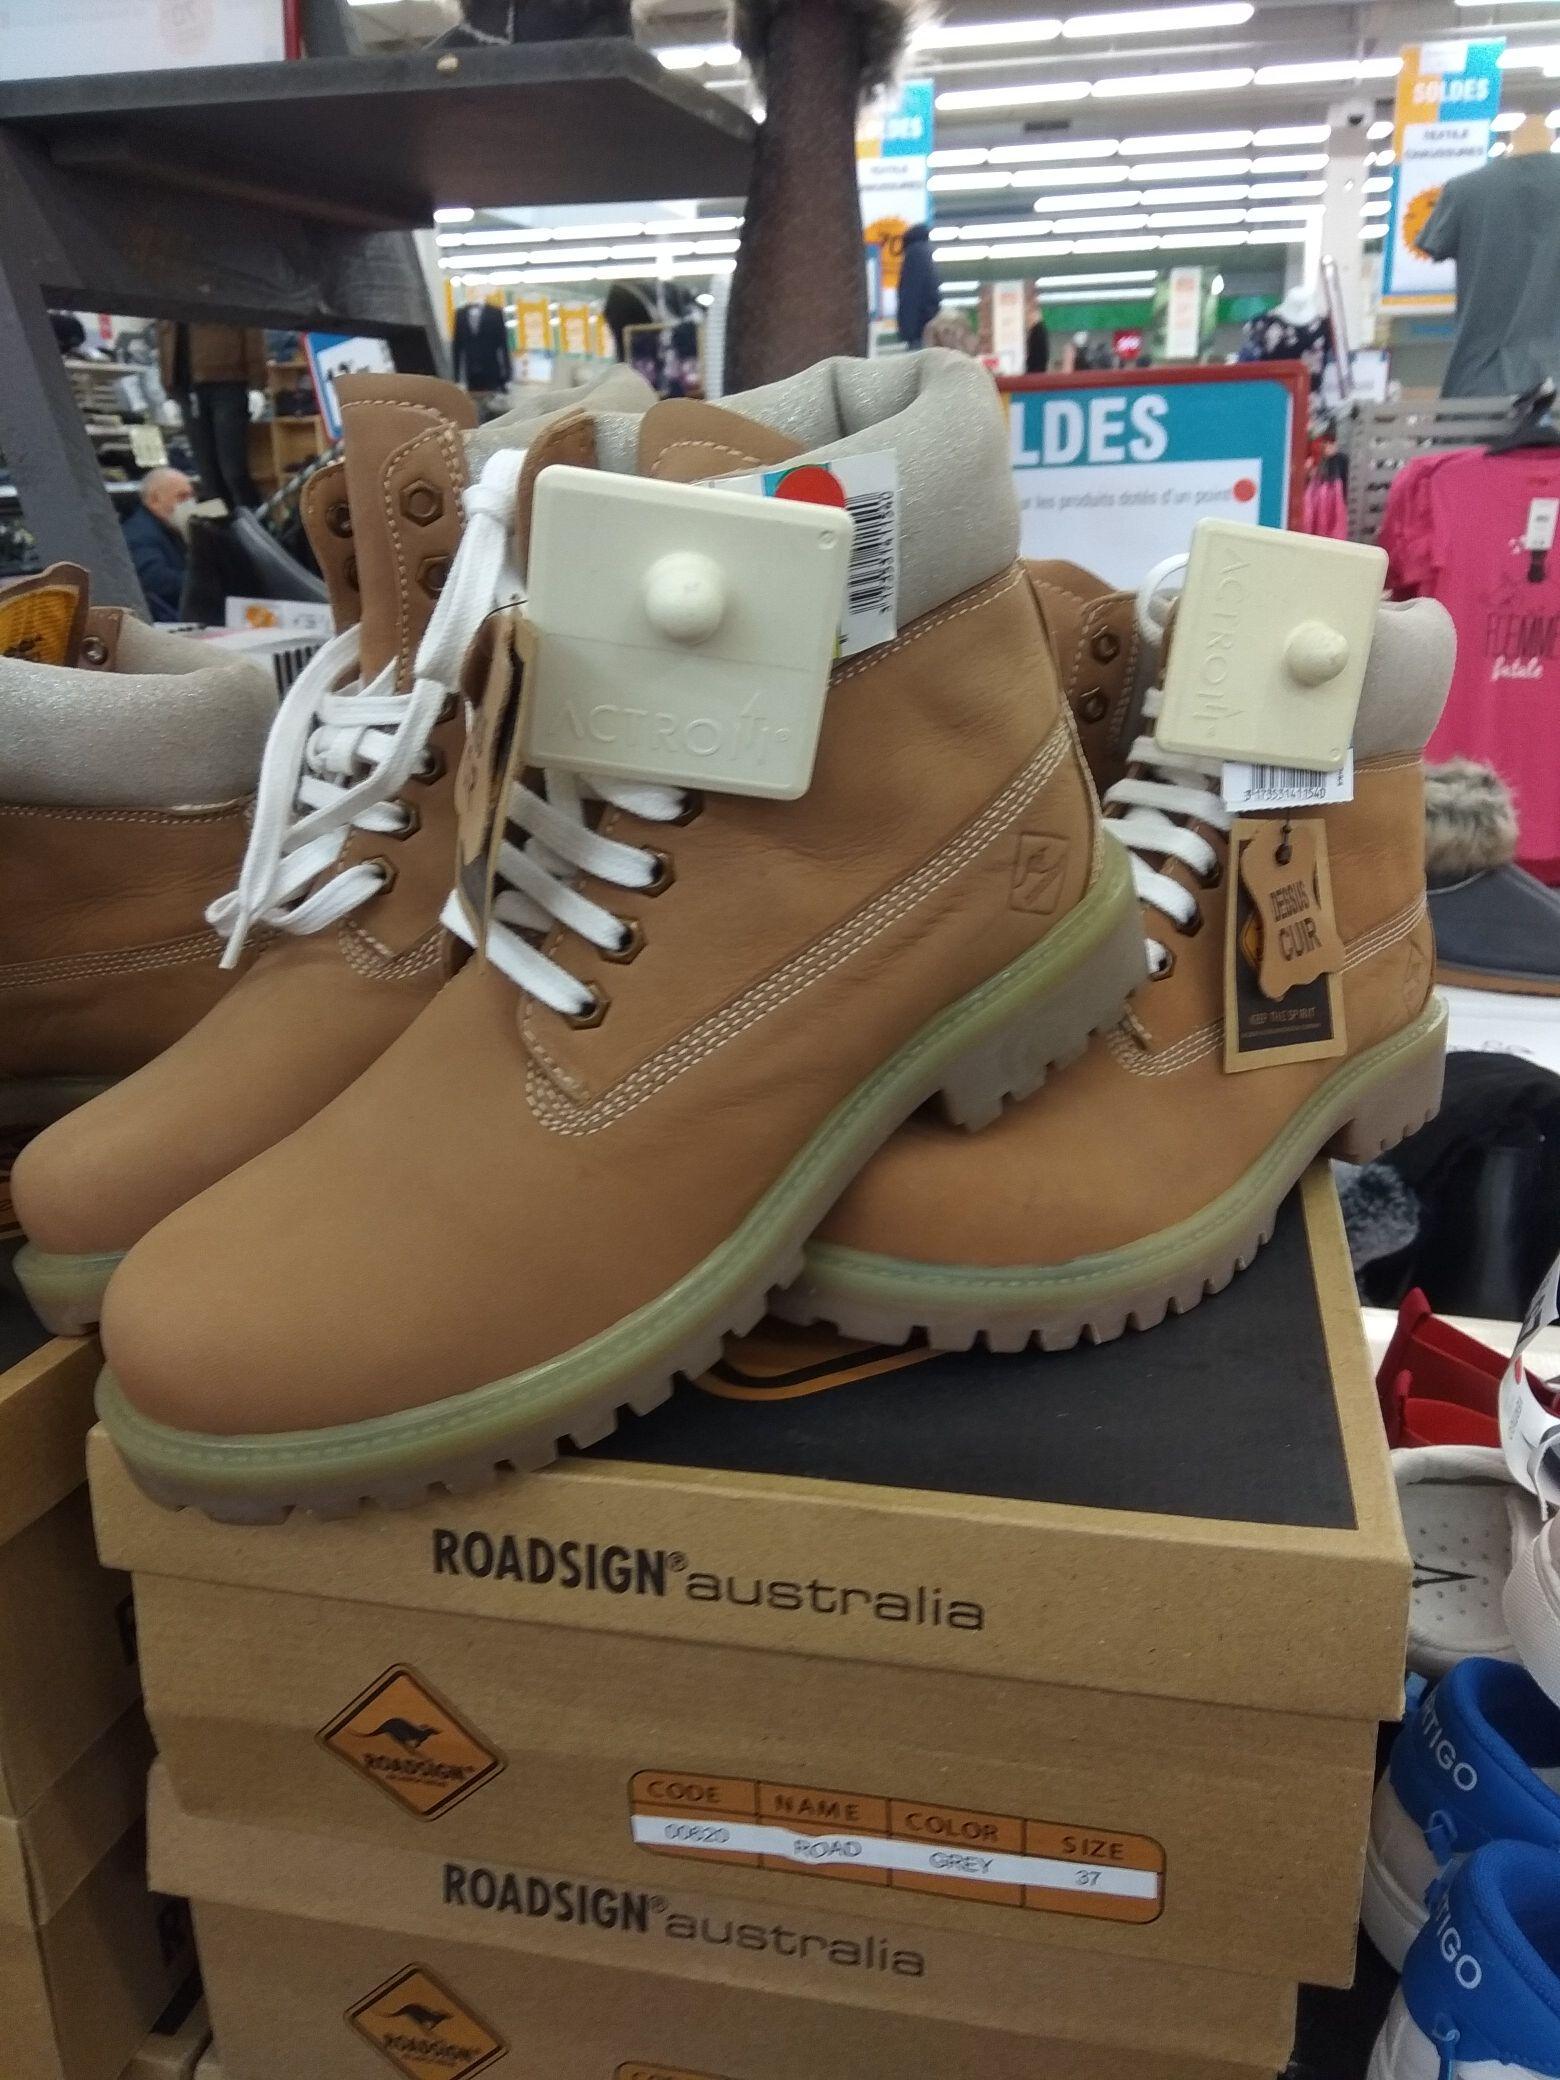 Chaussure Road Design cuir - Plusieurs tailles (Echirolles 38)